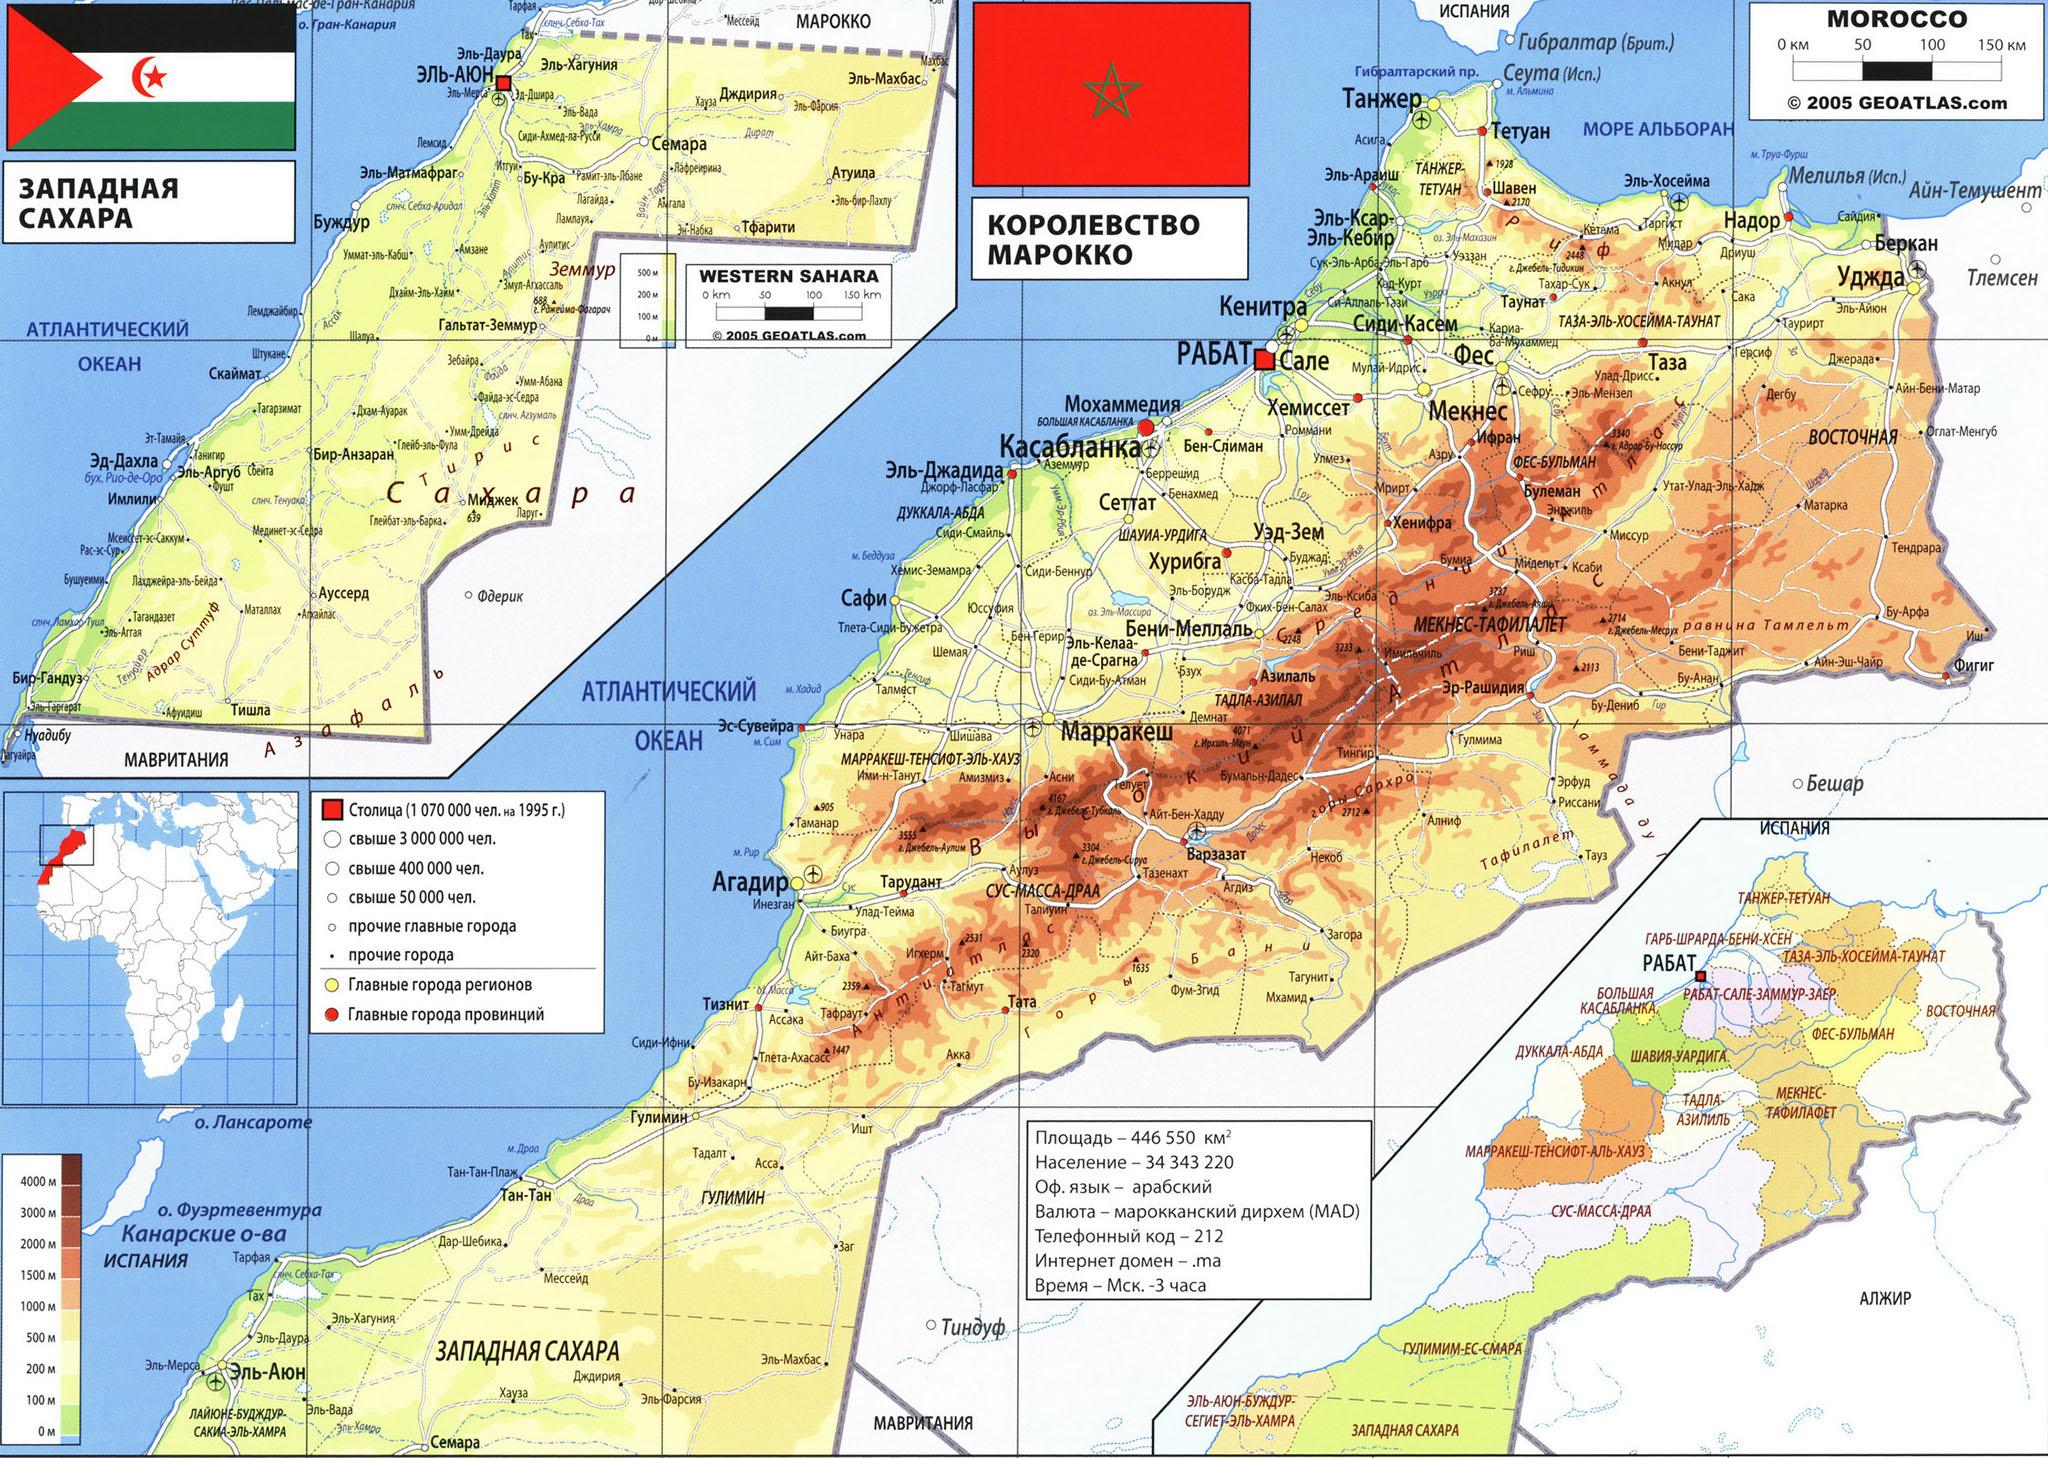 Marokko Na Karte Mira Karta Marokko Na Russkom Yazyke S Kurortami